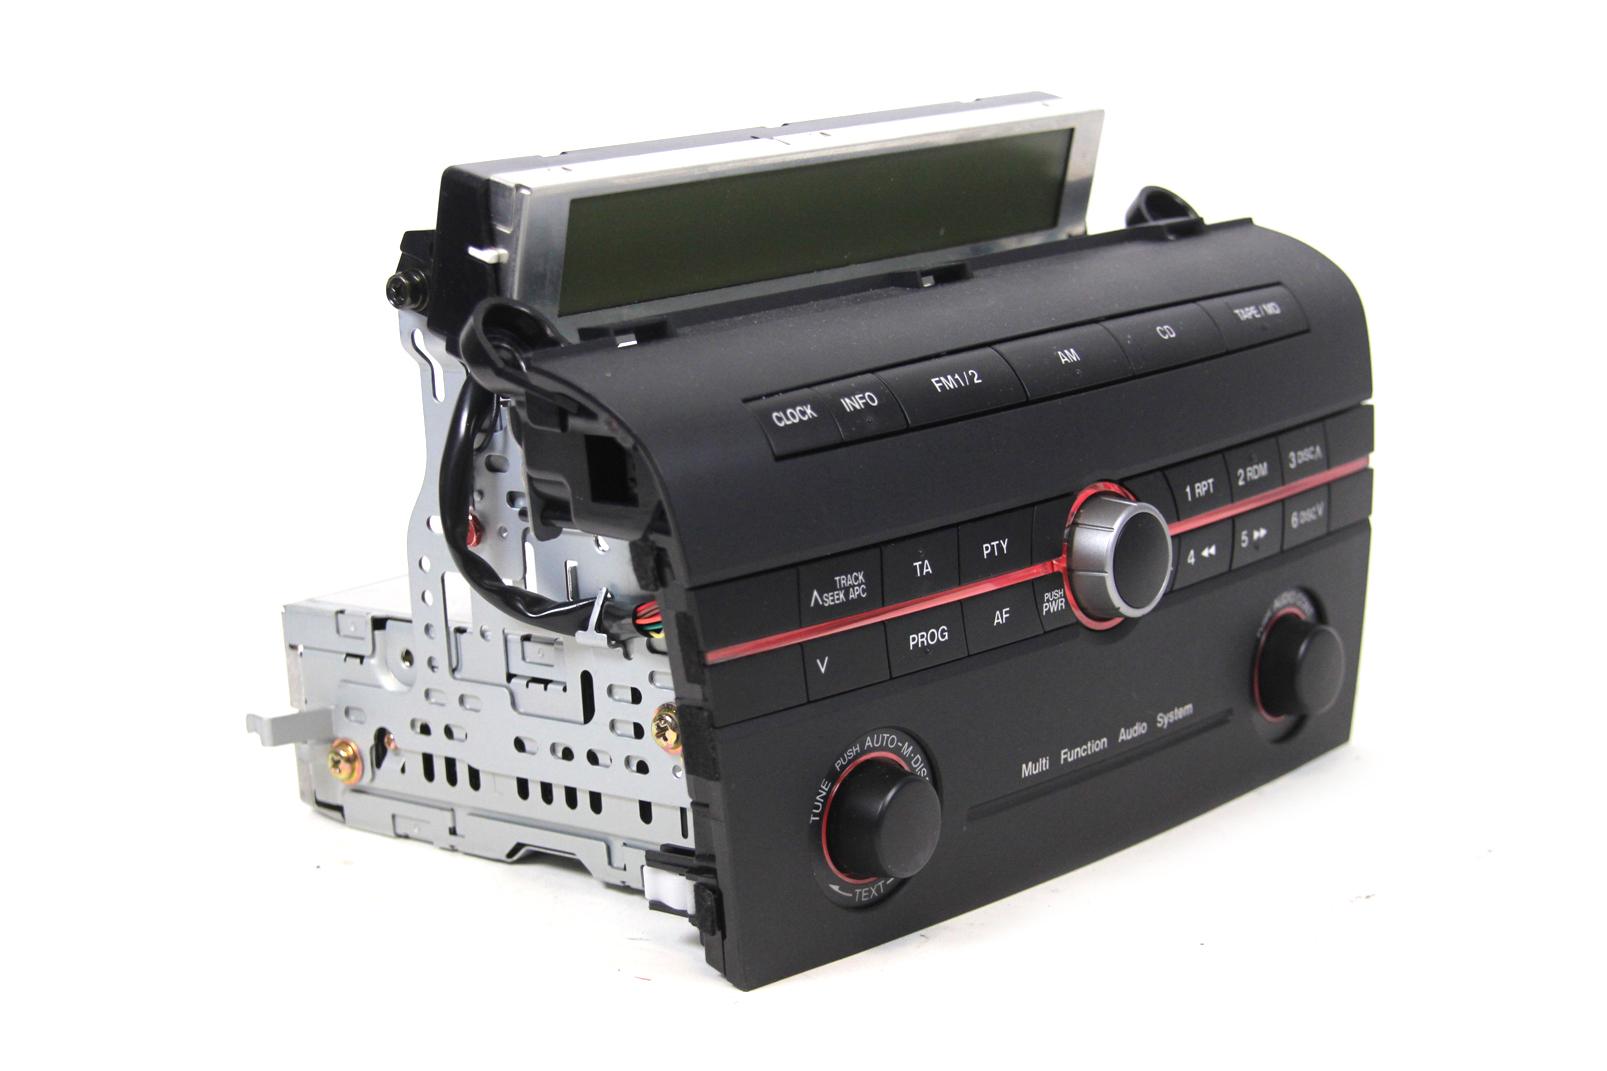 autoradio mazda 3 iii fm radio mit display spieler player. Black Bedroom Furniture Sets. Home Design Ideas